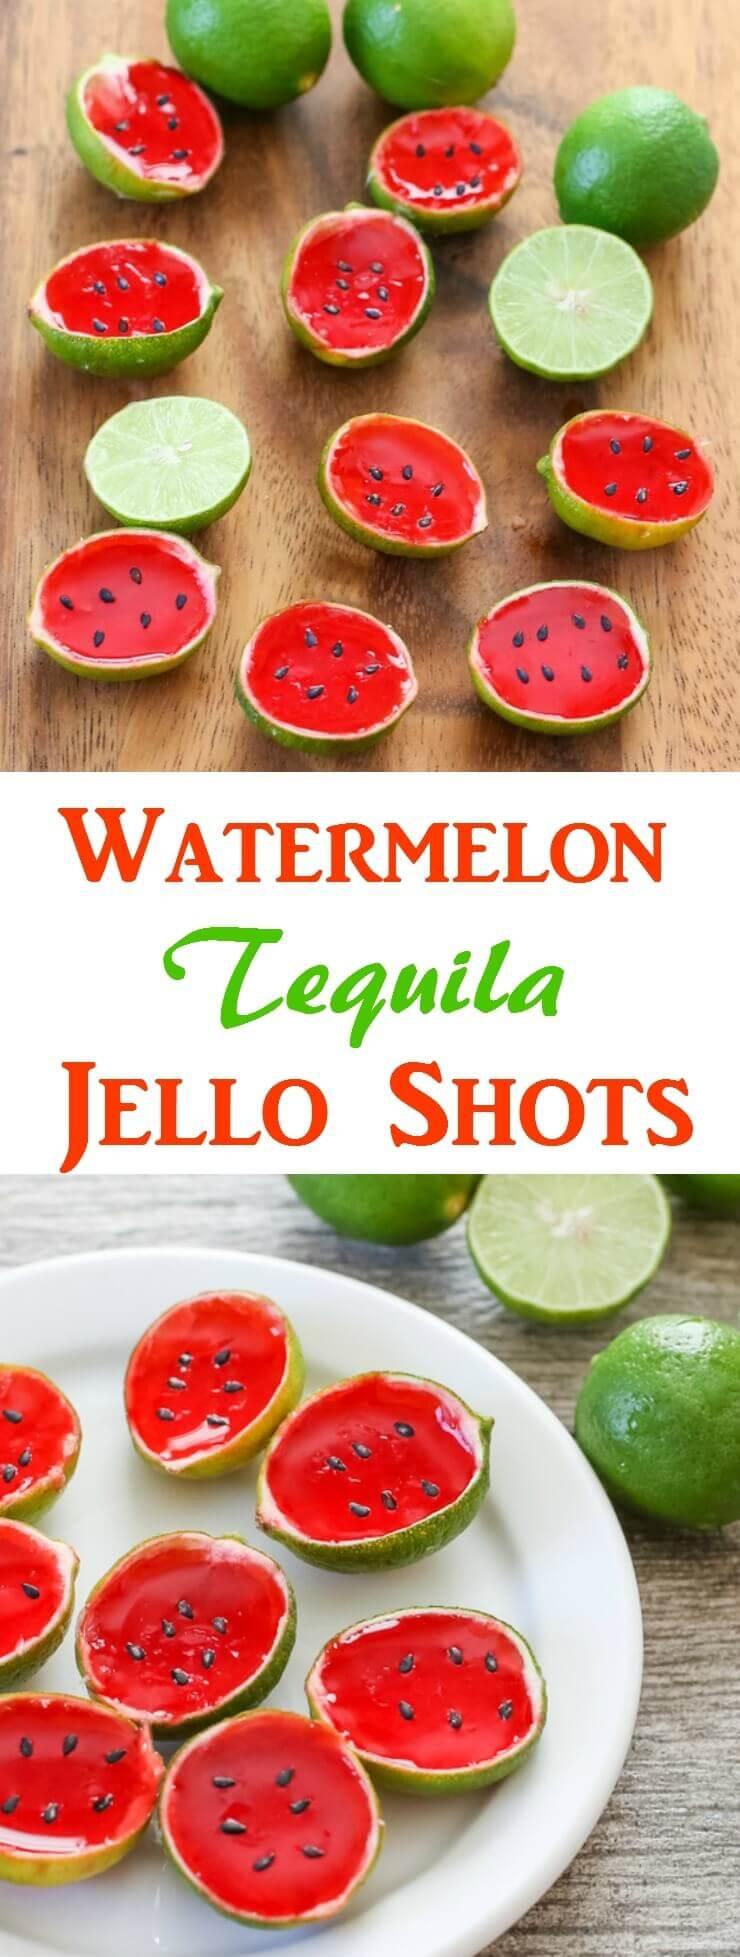 DIY einfache Ideen - Wassermelone Leckerei